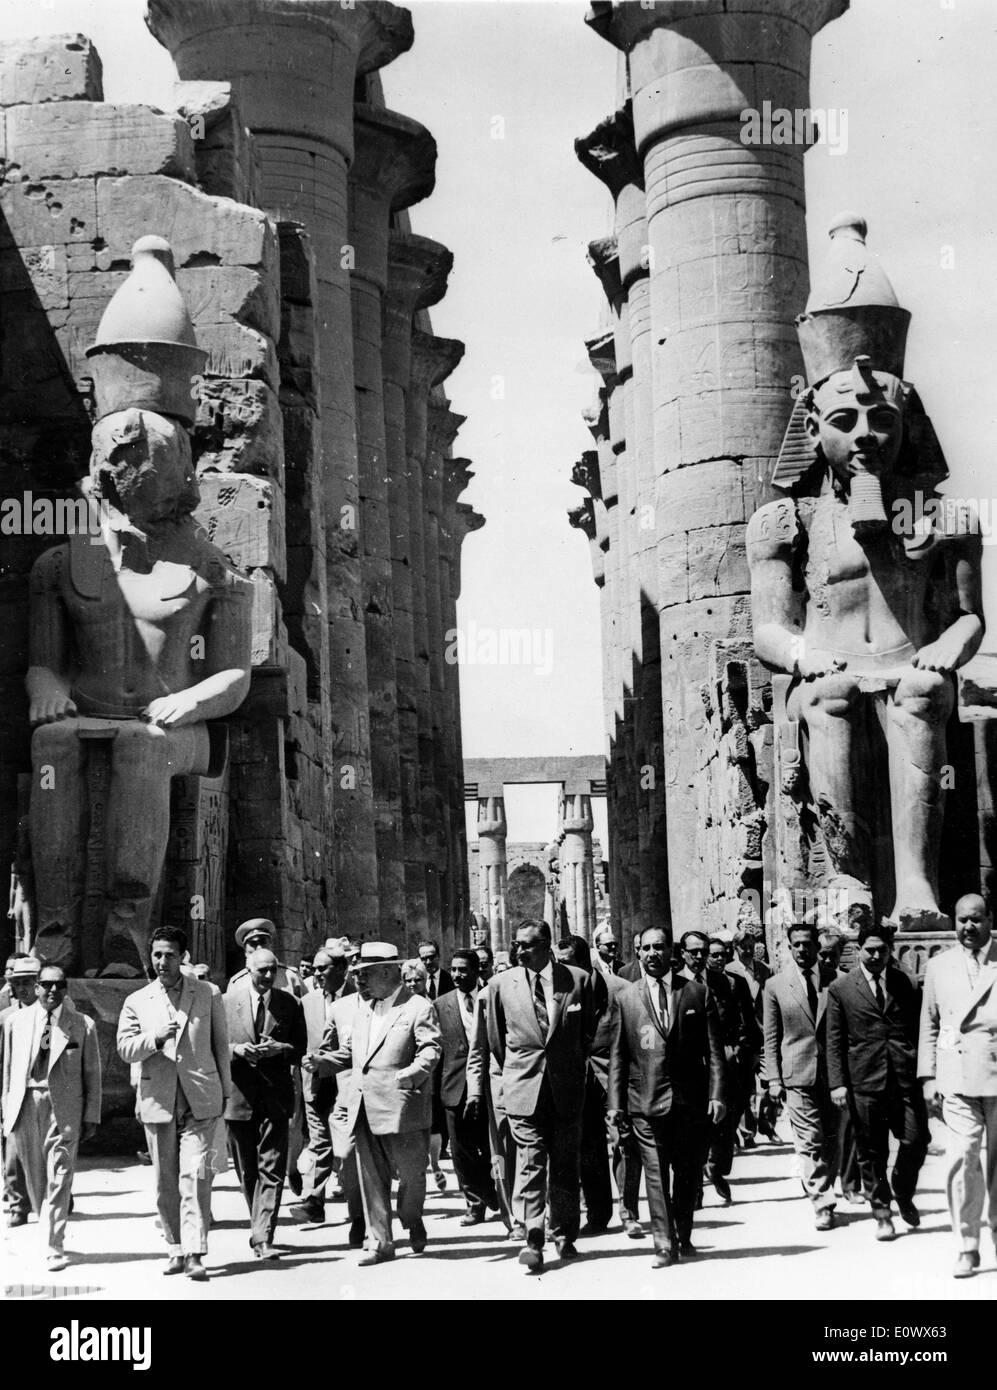 Nikita Khrushchev visits the Temple of Luxor with Gamal Abdel Nasser - Stock Image